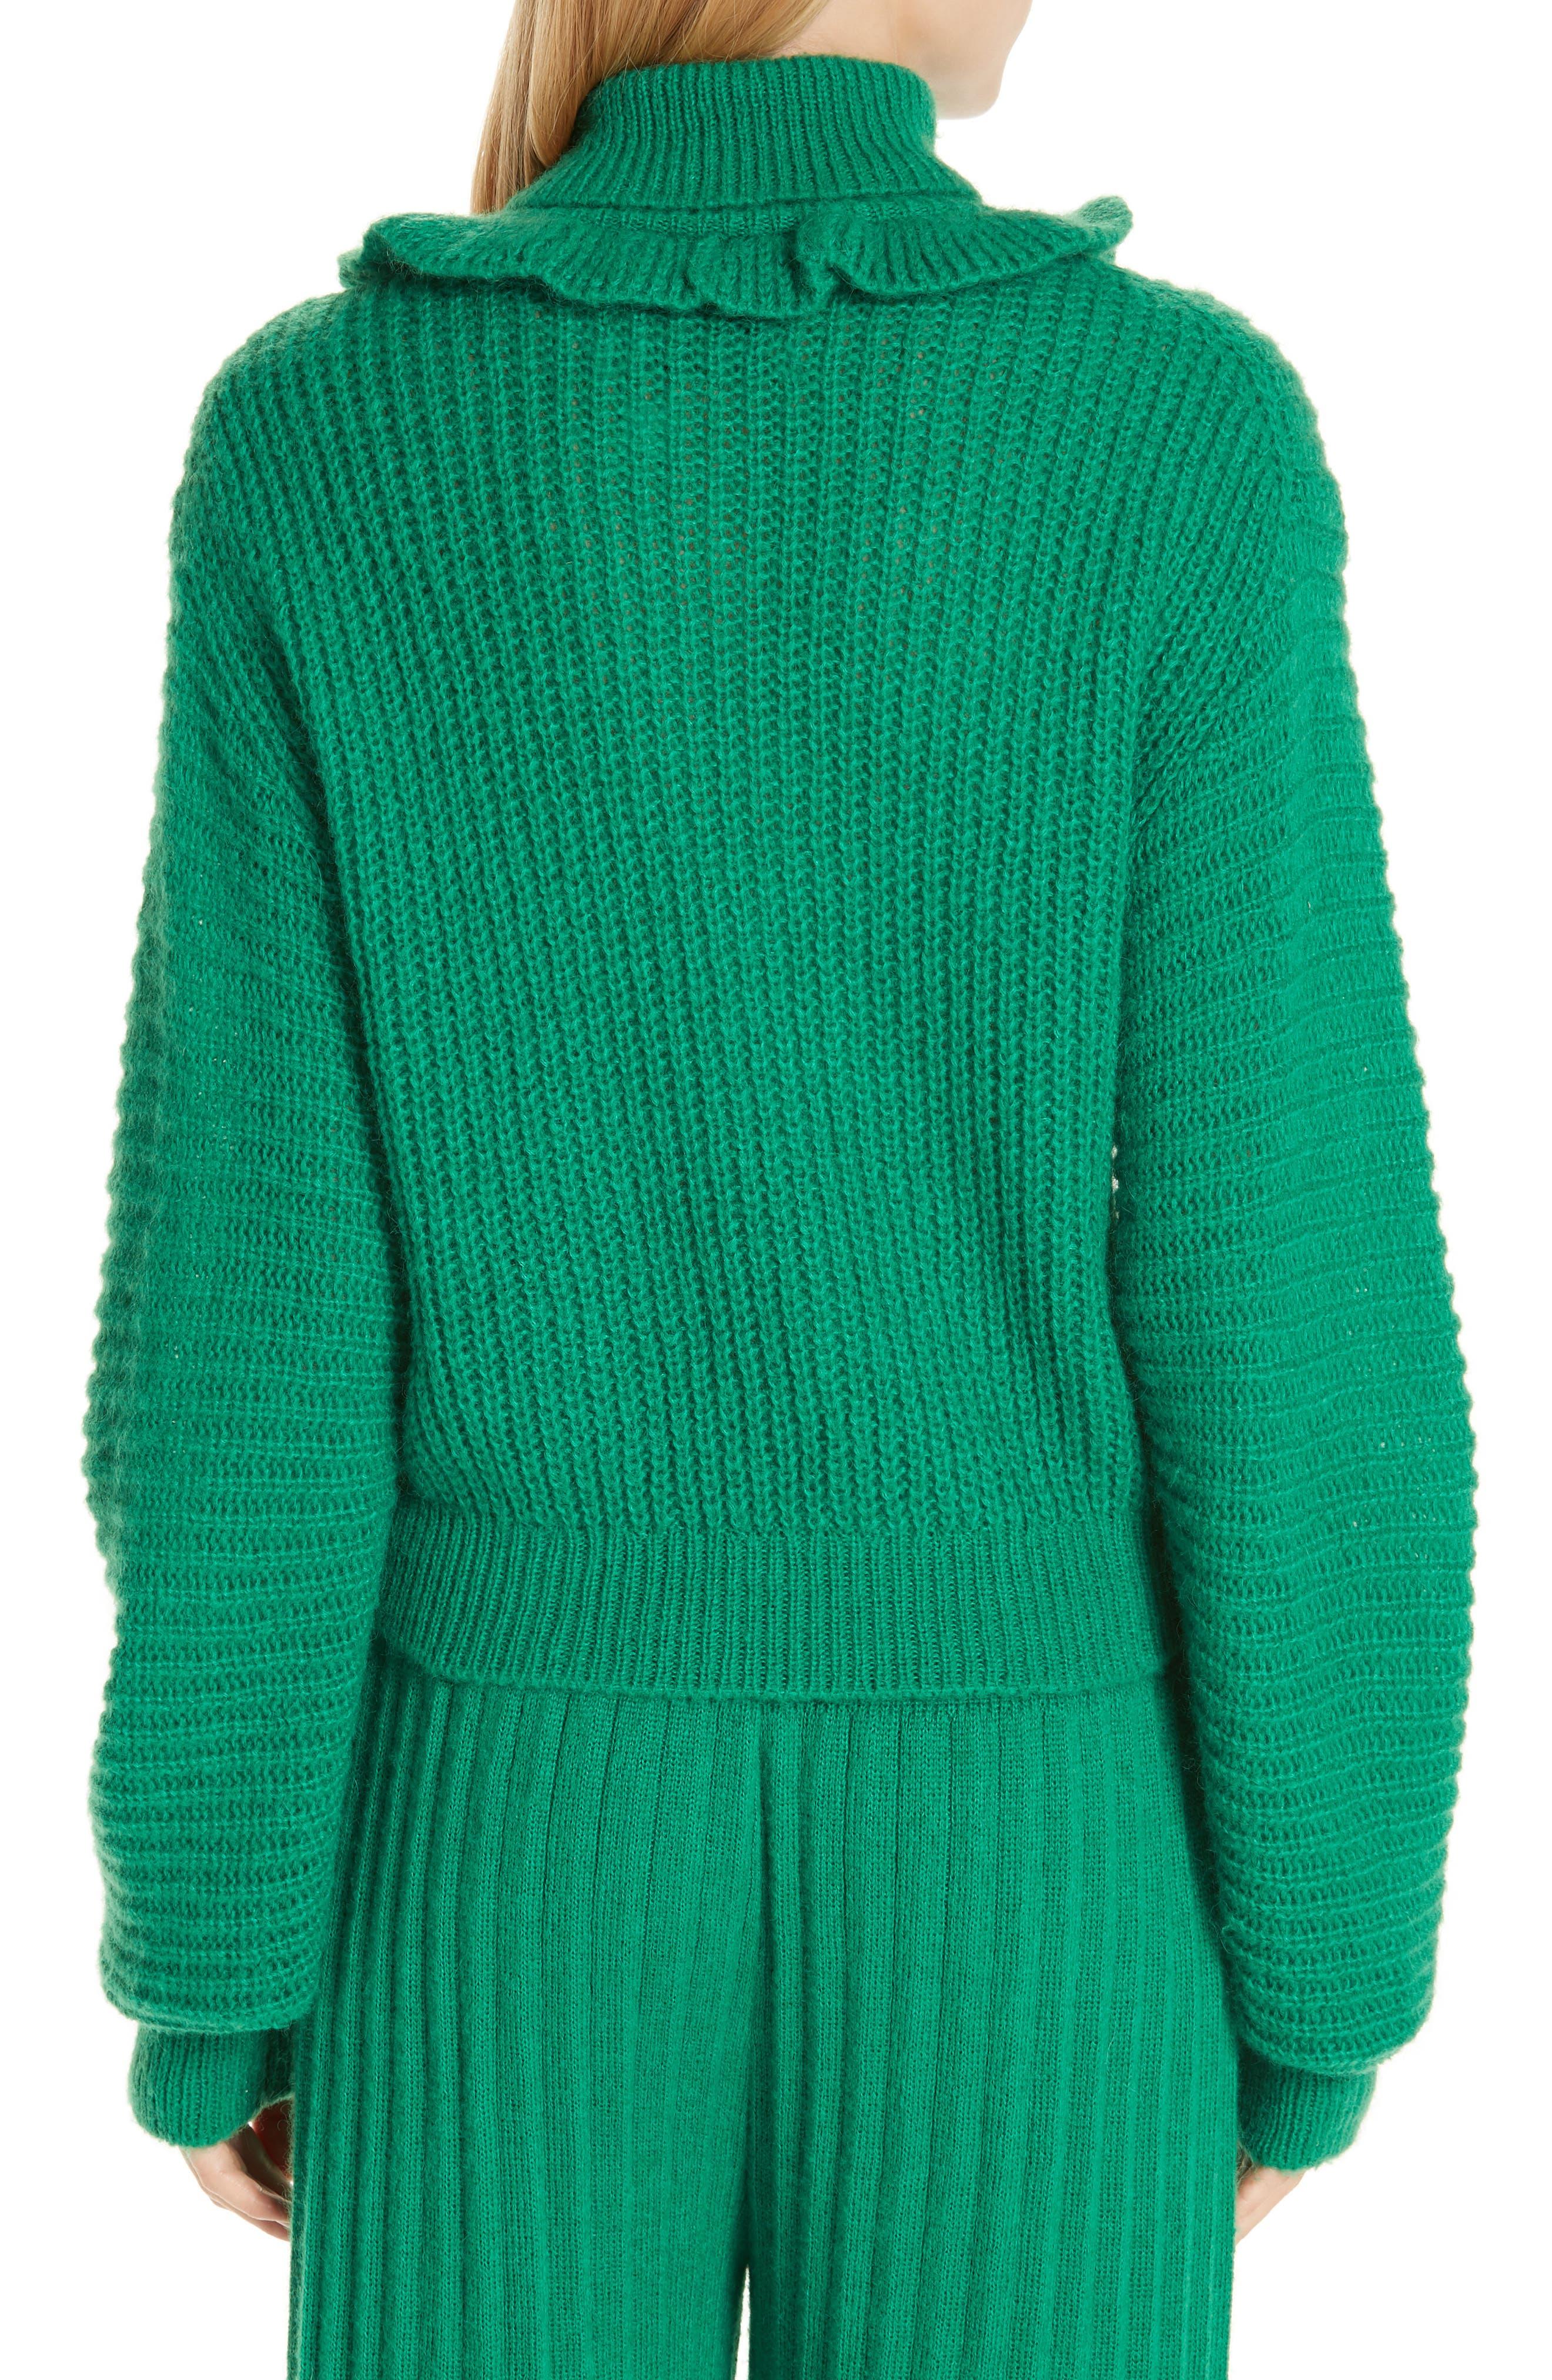 Ruffle Neck Sweater,                             Alternate thumbnail 2, color,                             GRASS GREEN